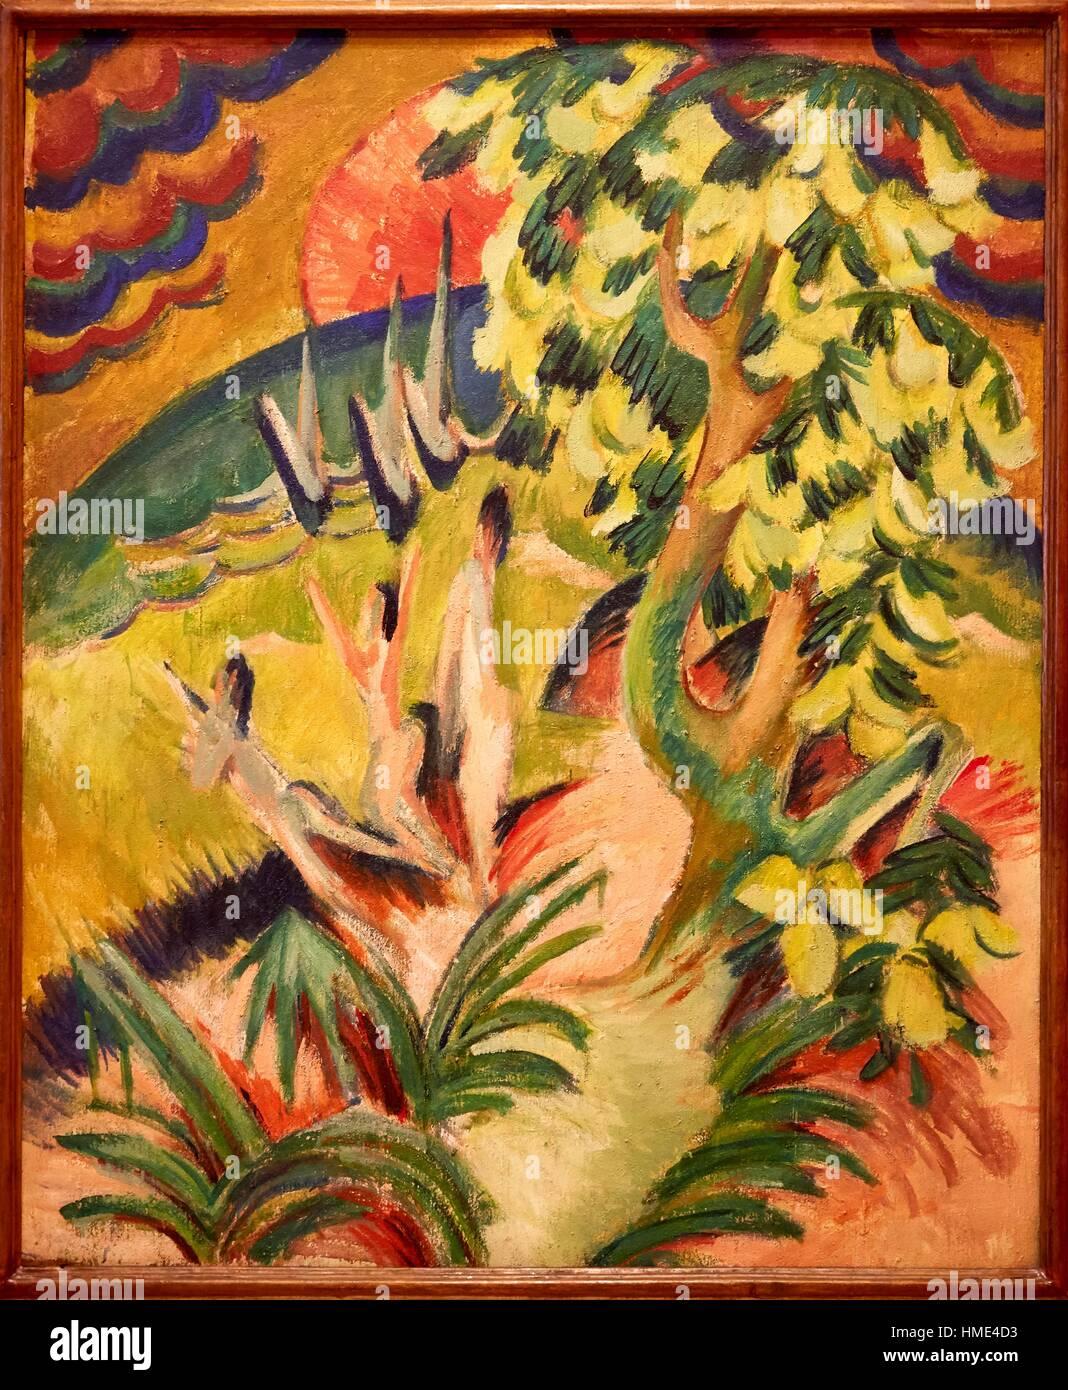 '''Curving Bay'', 1914, Ernst Ludwig Kirchner, Thyssen-Bornemisza Museum, Madrid, Spain - Stock Image